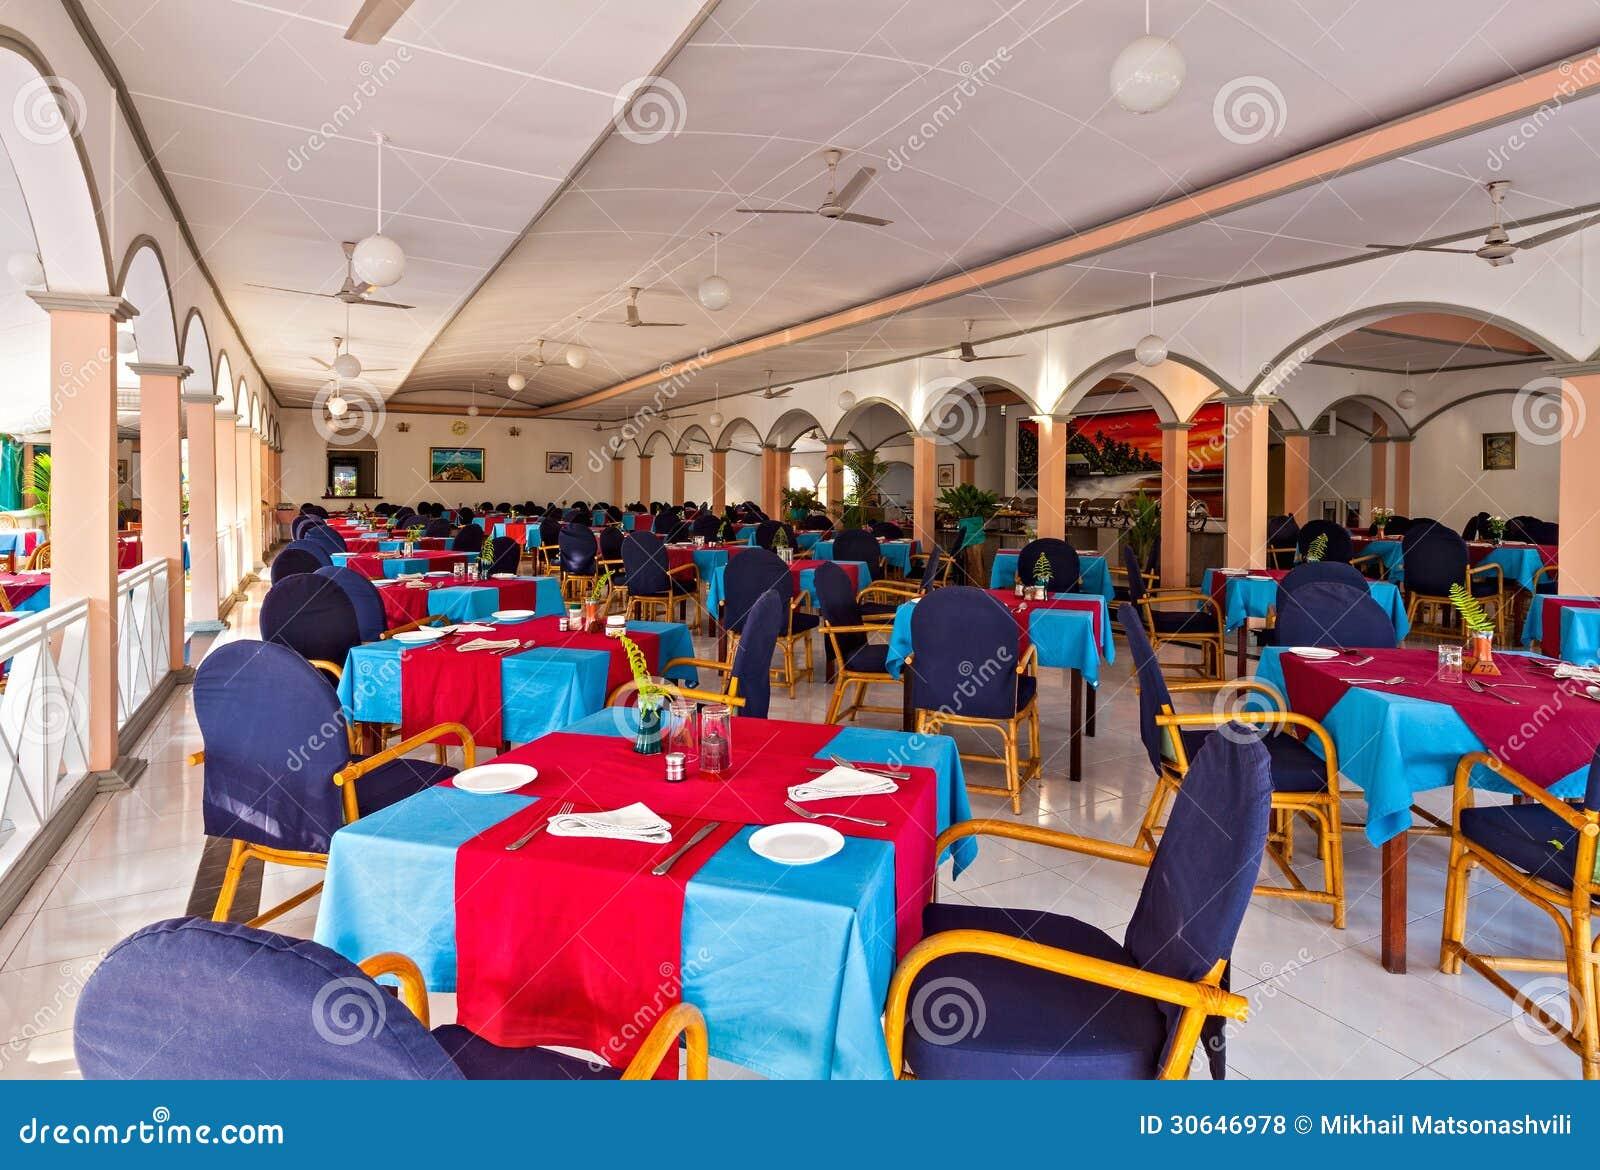 Interior of the restaurant royalty free stock photos